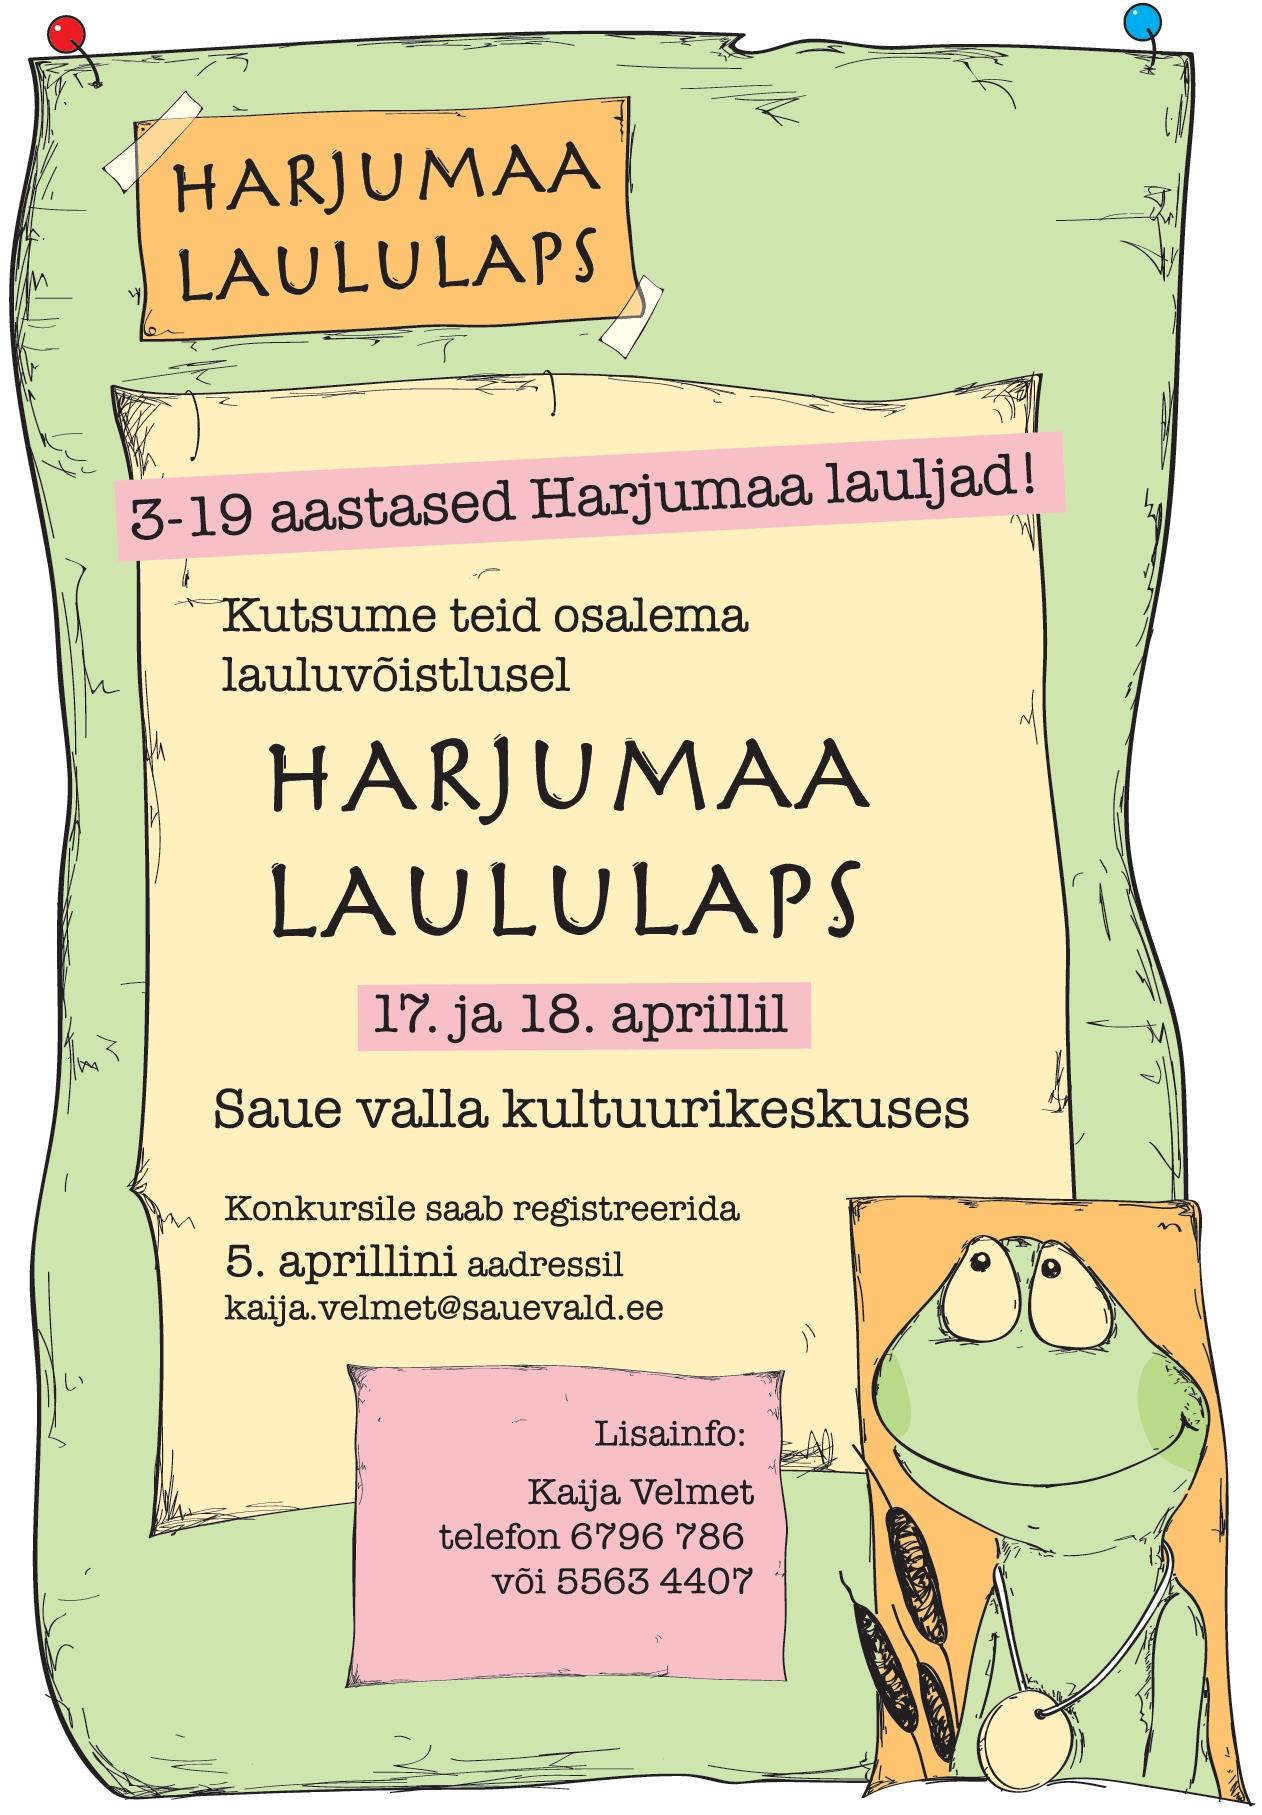 harjumaa_laululaps